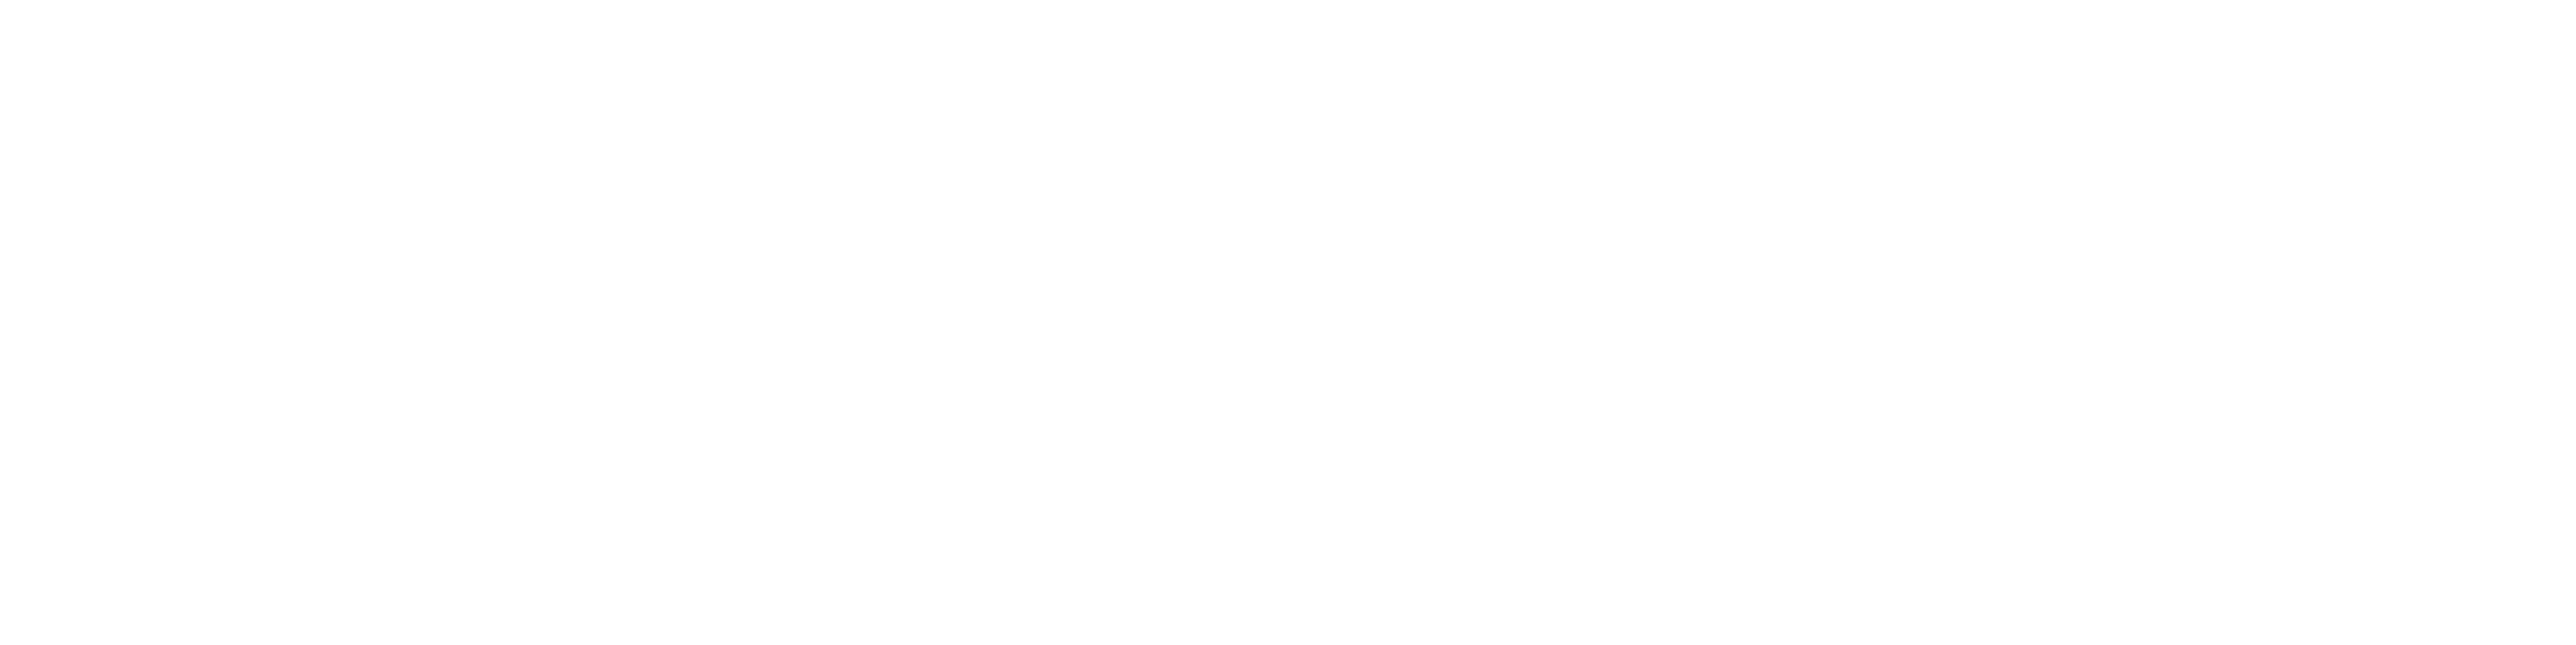 MESH/Diversity